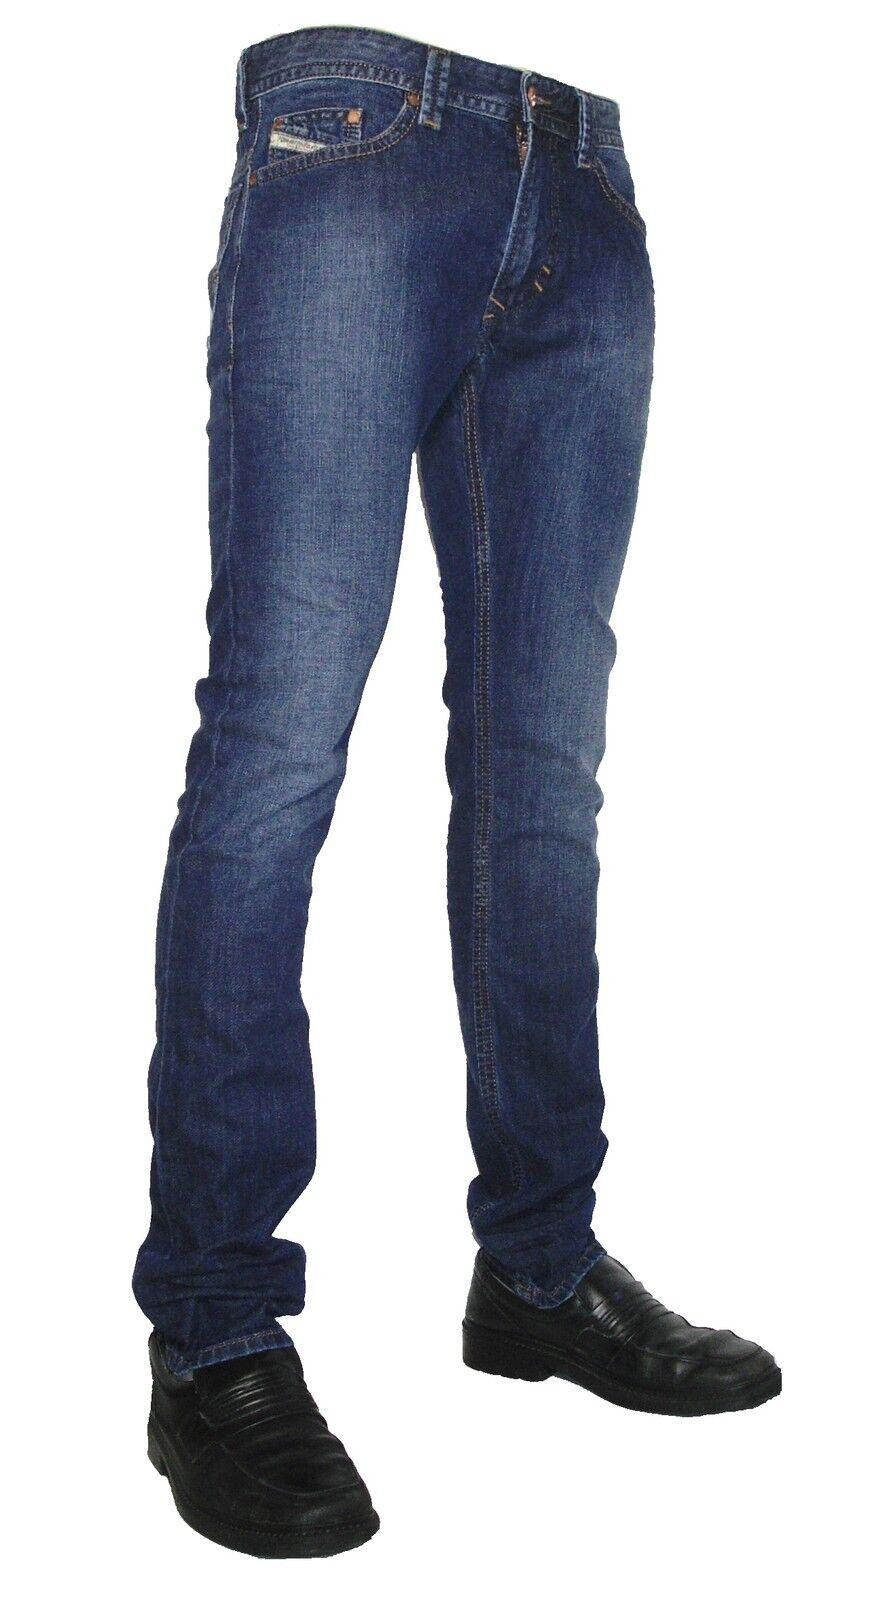 DIESEL jeans uomo THAVAR 0855l  slim-skinny  Blu Colorei attenuati NUOVO